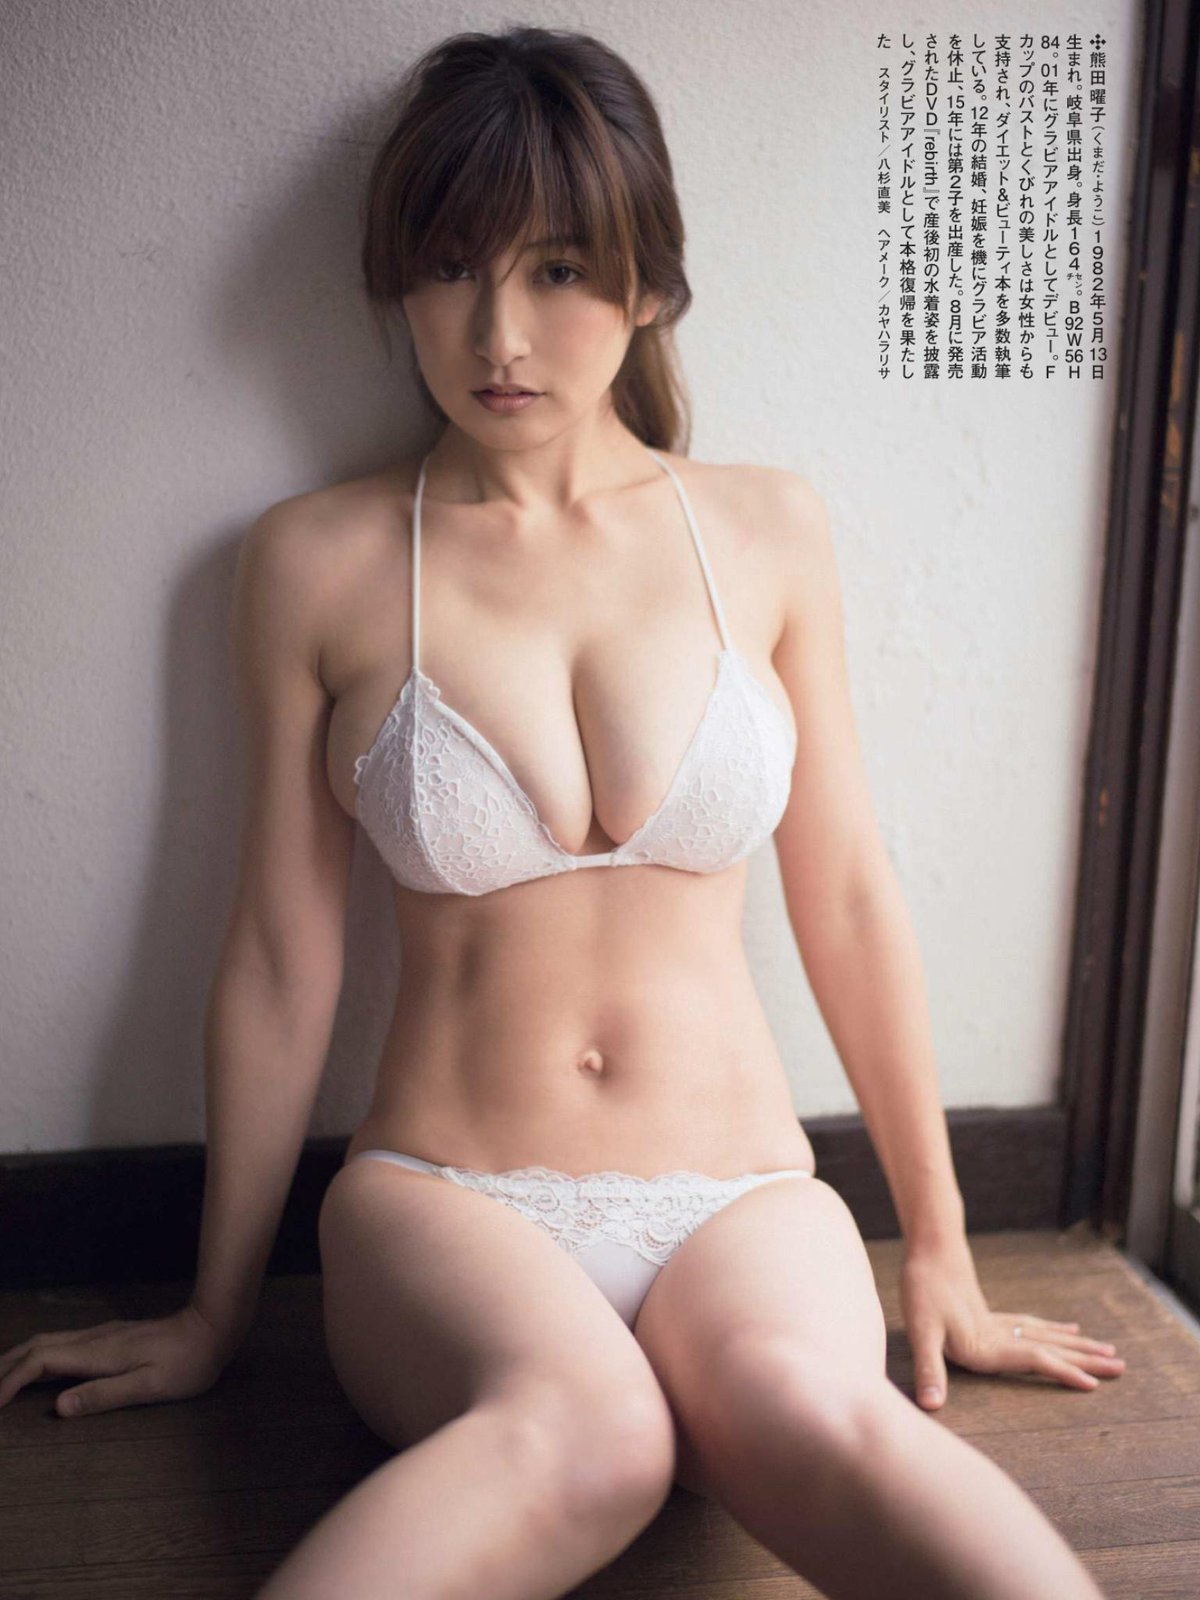 Yoko Kumada 熊田曜子, Shukan Post 2016.12.16 (週刊ポスト 2016年12月16日号)